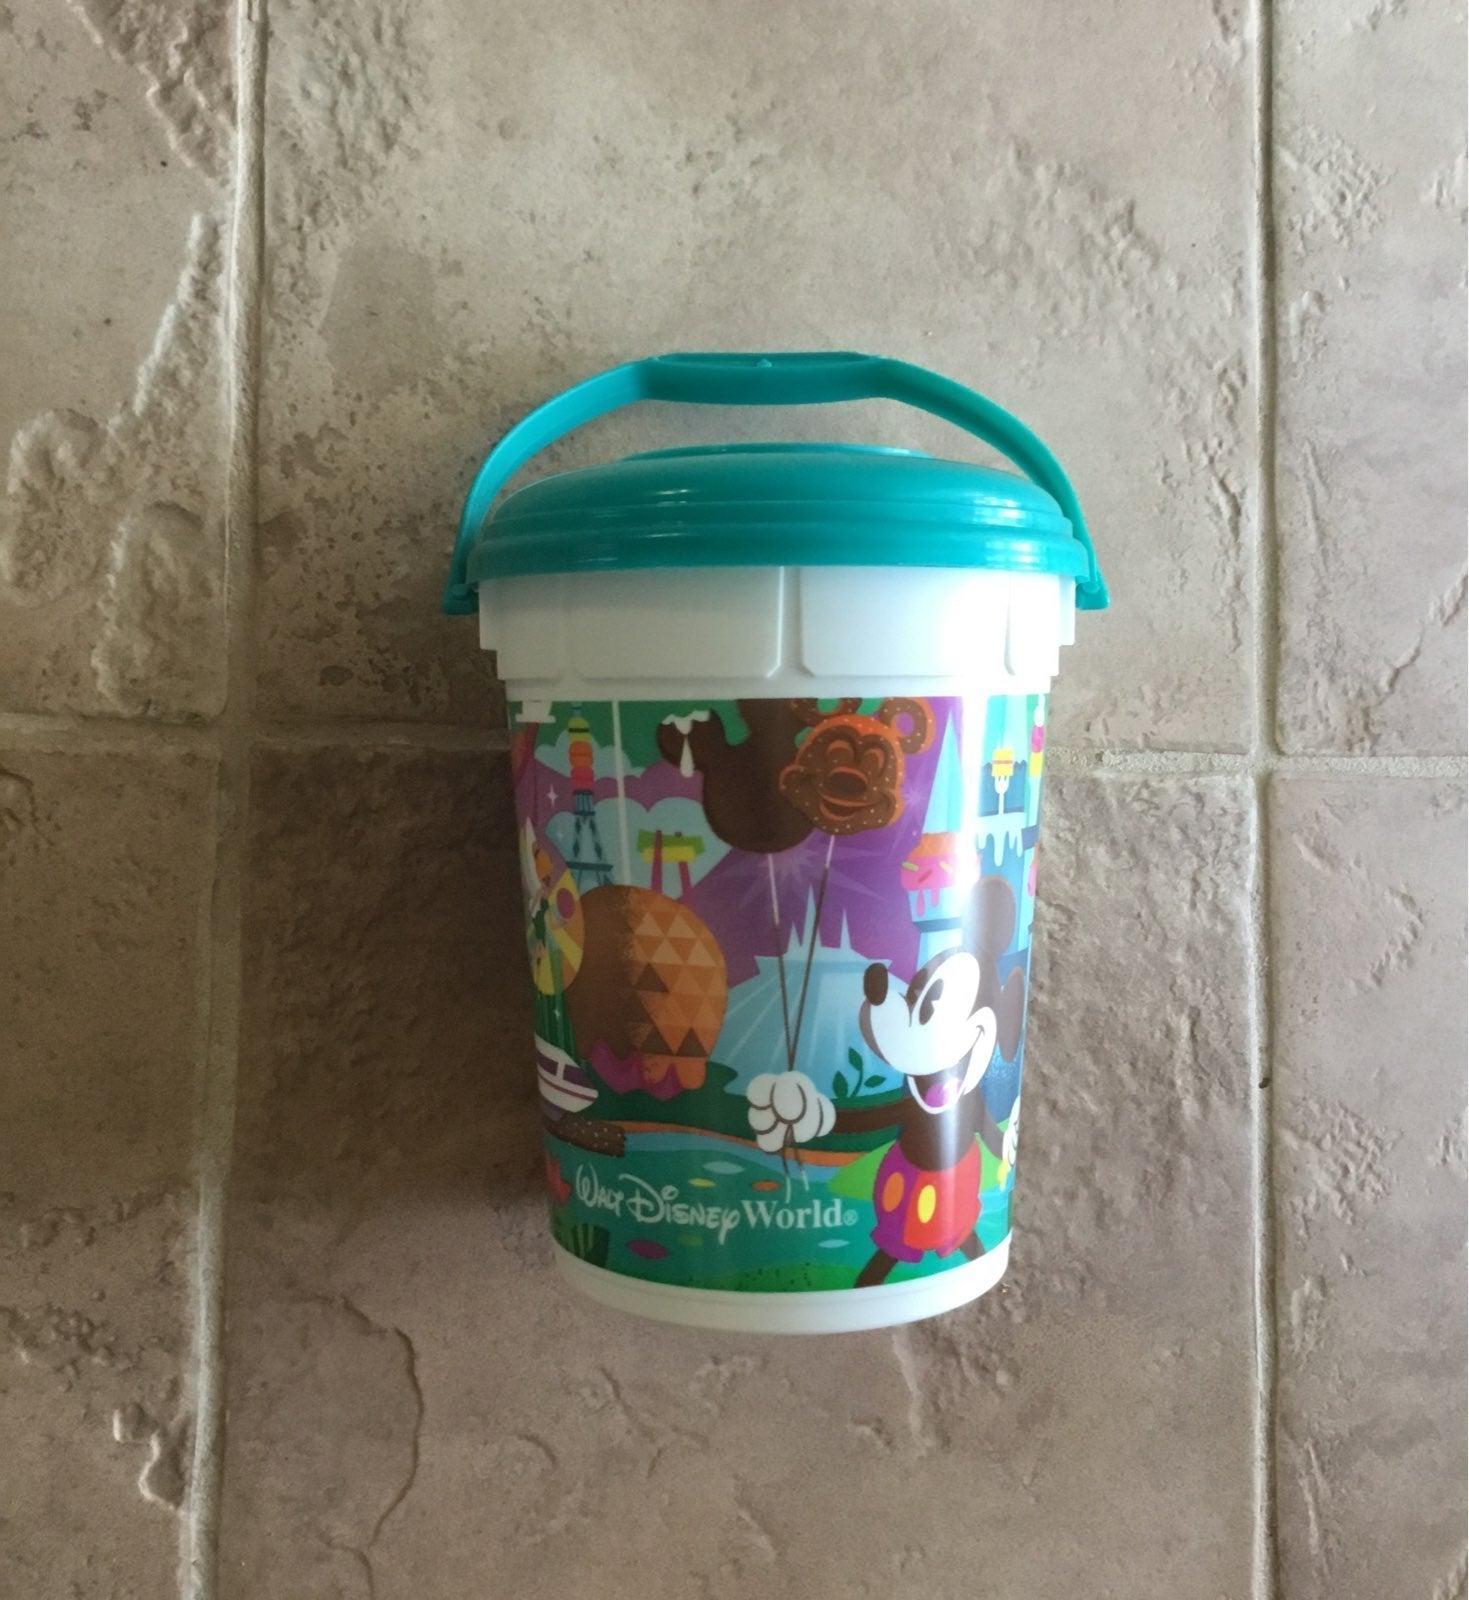 Vintage Walt Disney World bucket